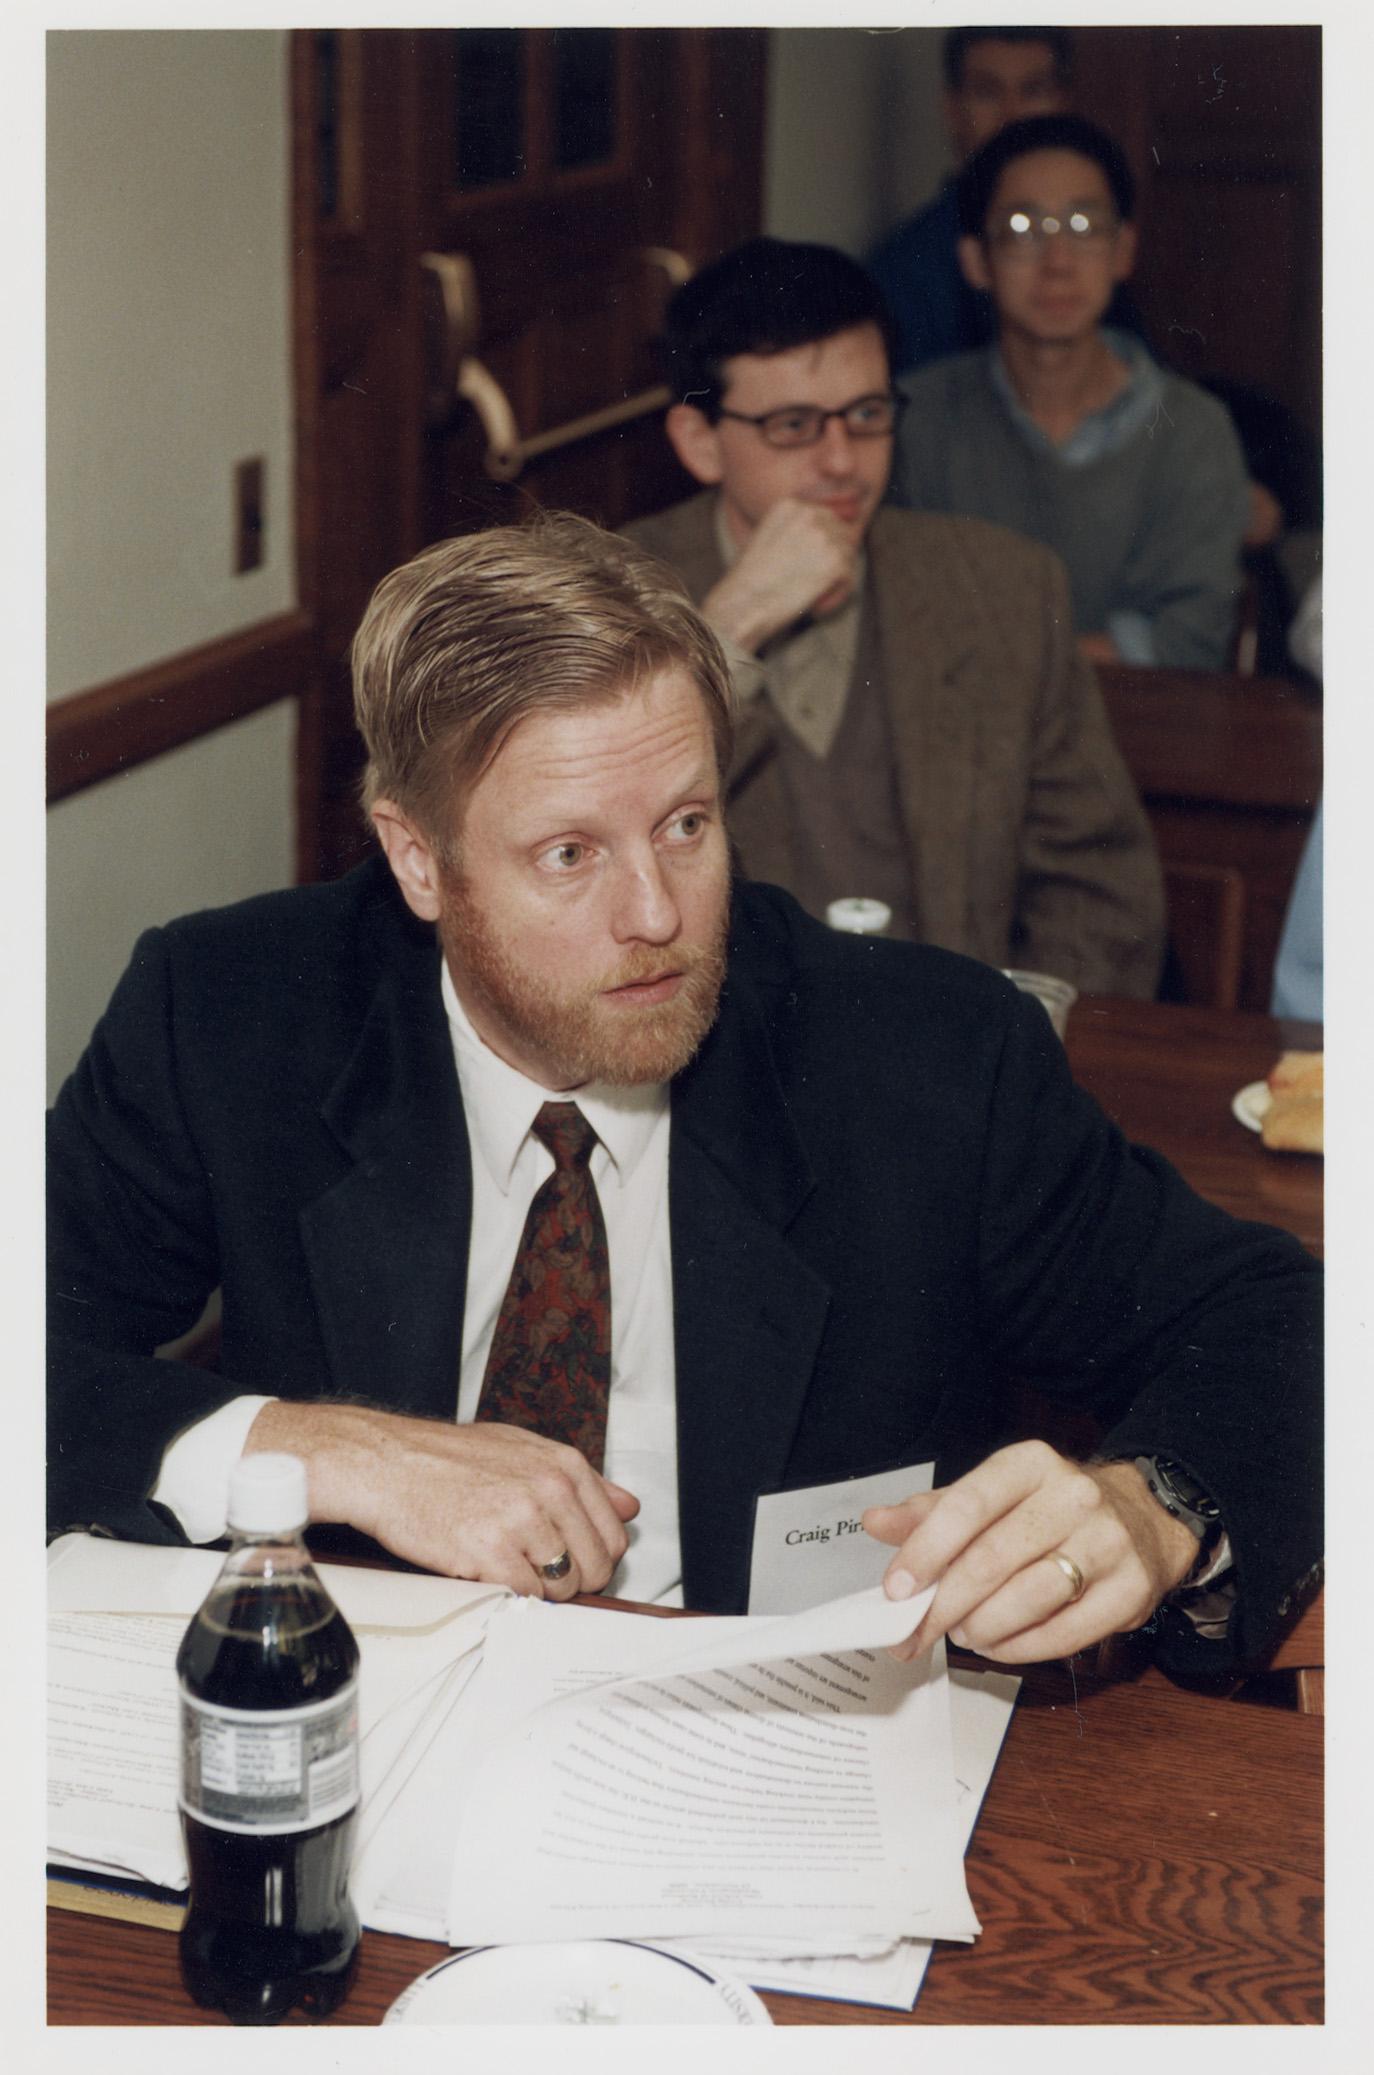 Wash. U. Olin School of Business Prof. S. Craig Pirrong